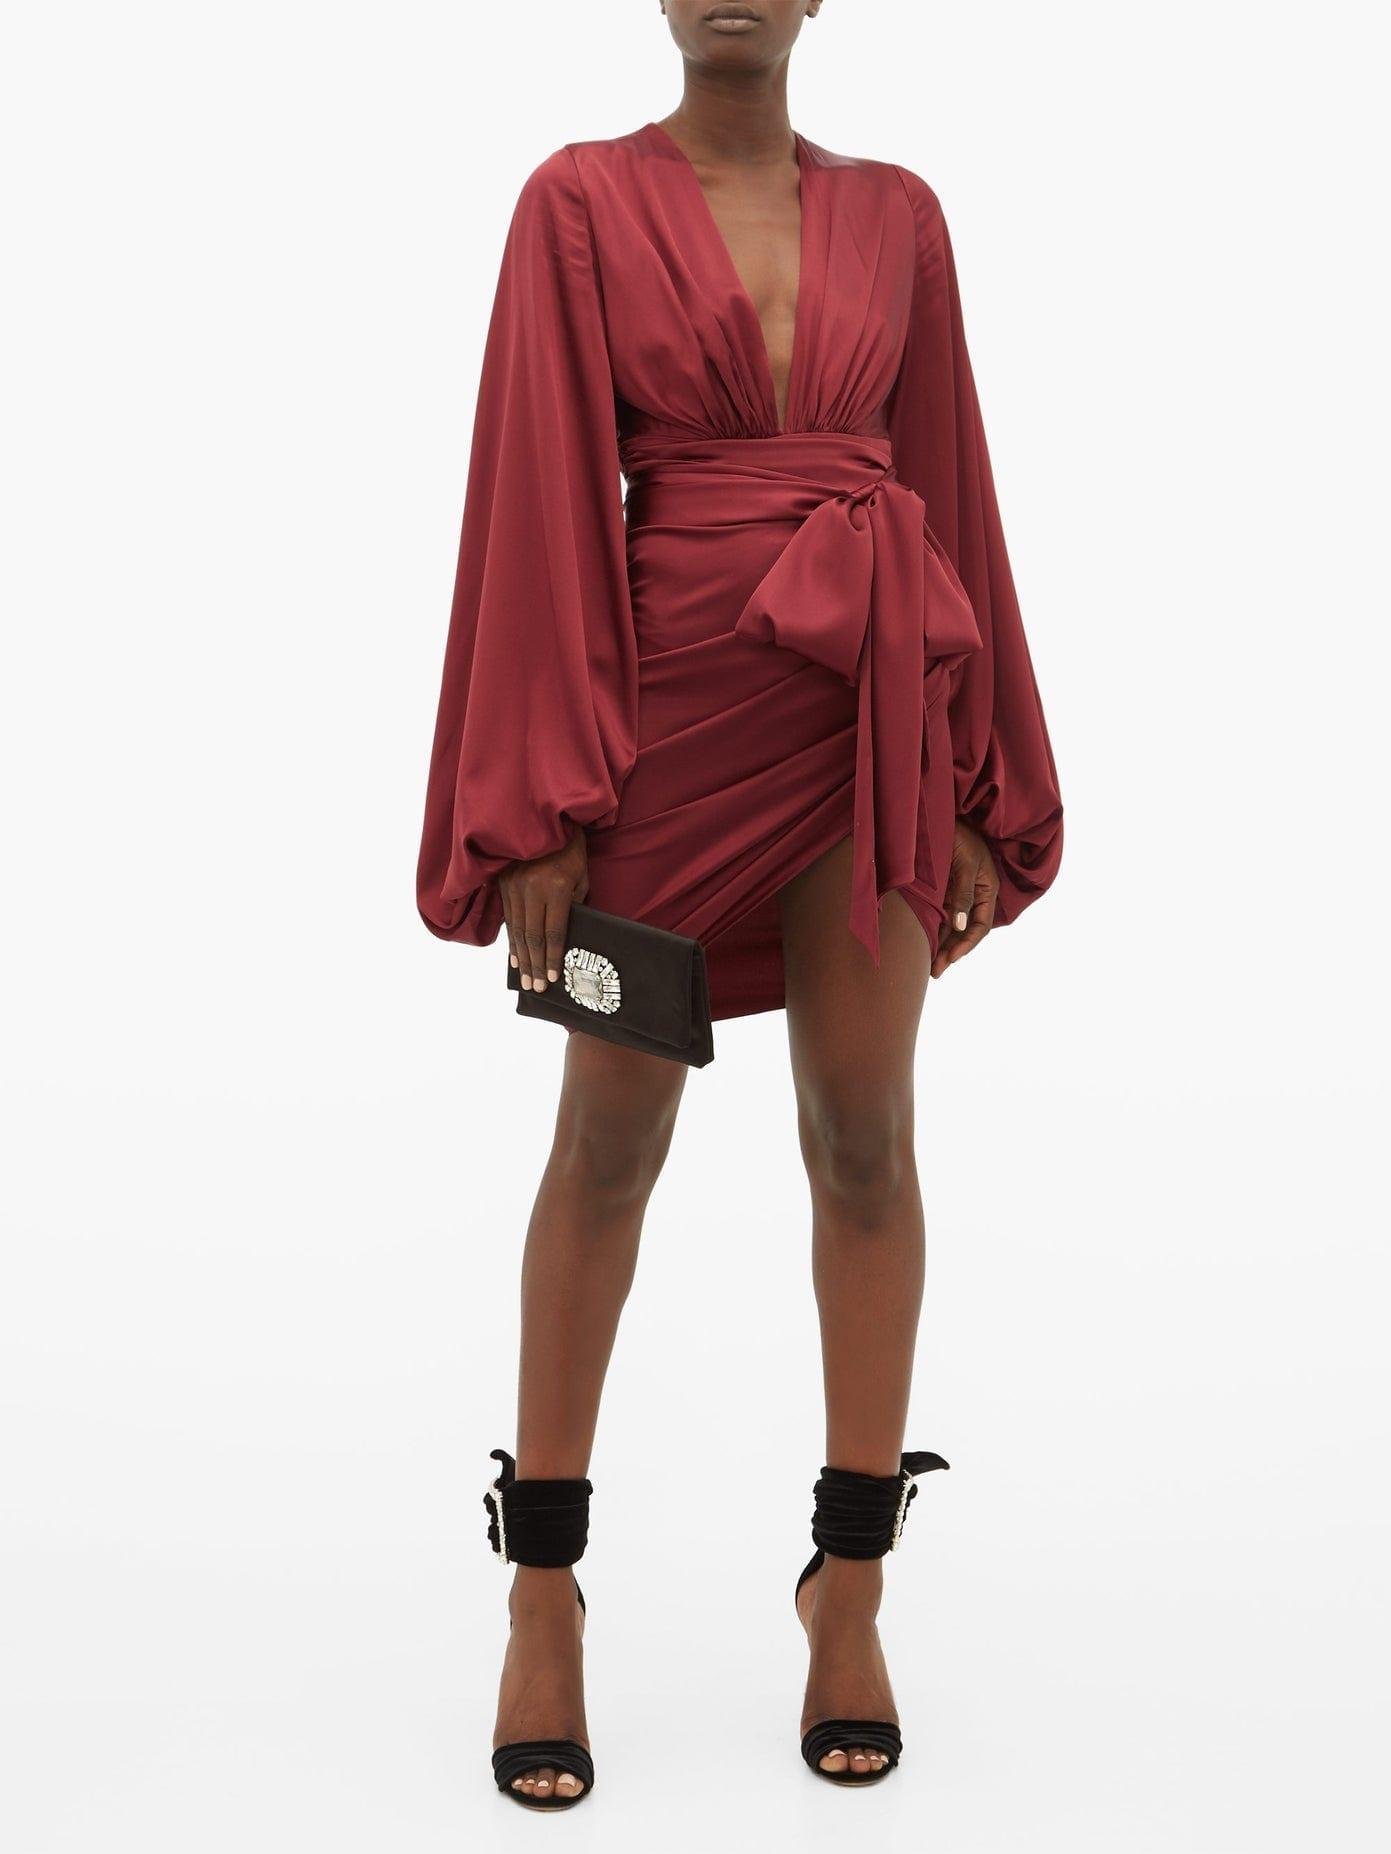 ALEXANDRE VAUTHIER Plunge-neck Ruched Silk-blend Satin Dress